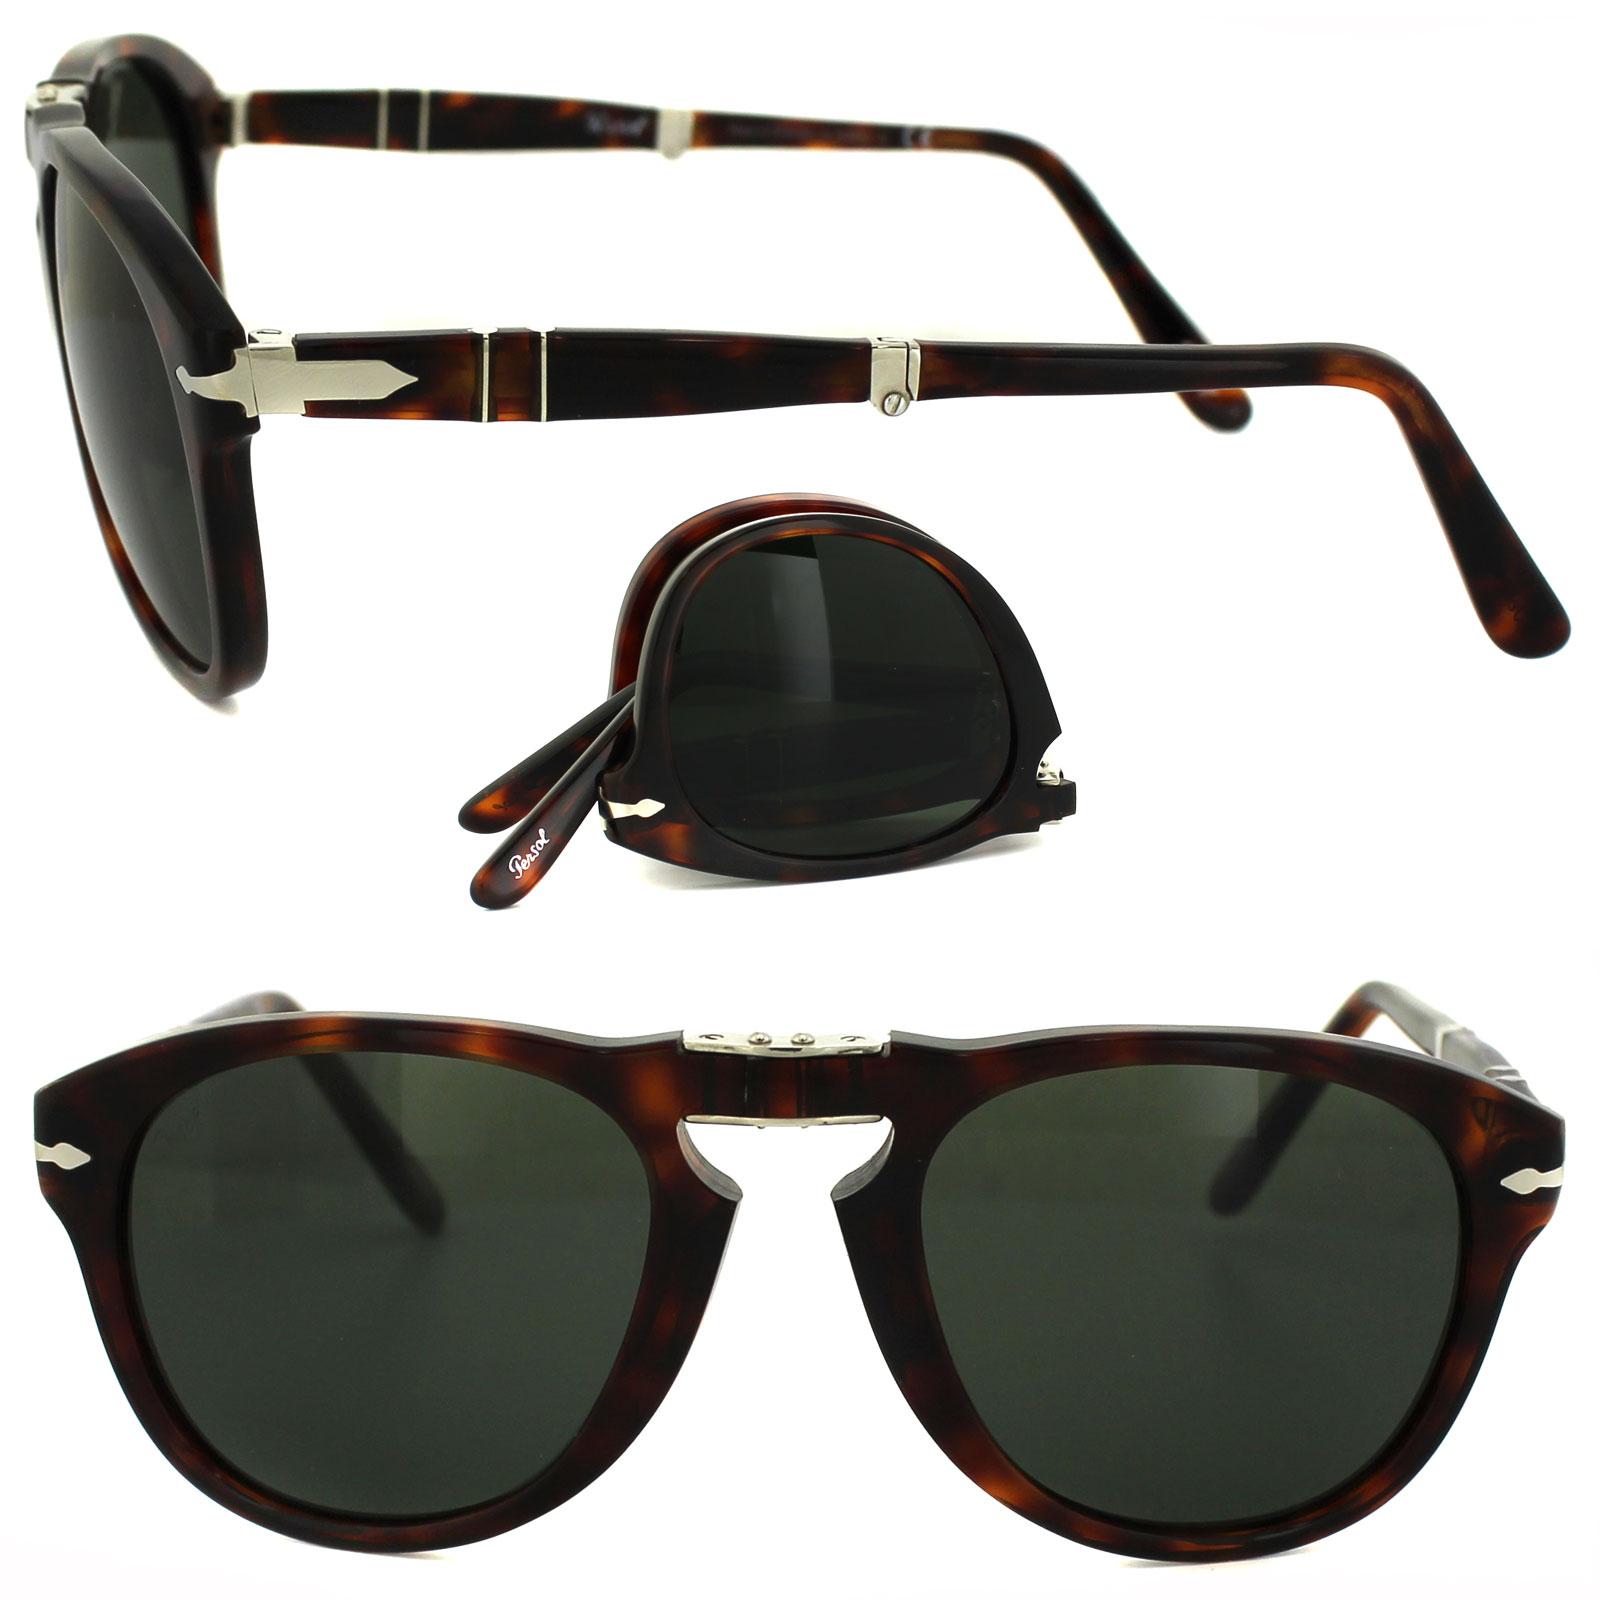 9b0c0bbac7 Sentinel Persol Sunglasses 0714 24 31 Havana Green Folding Steve McQueen  52mm